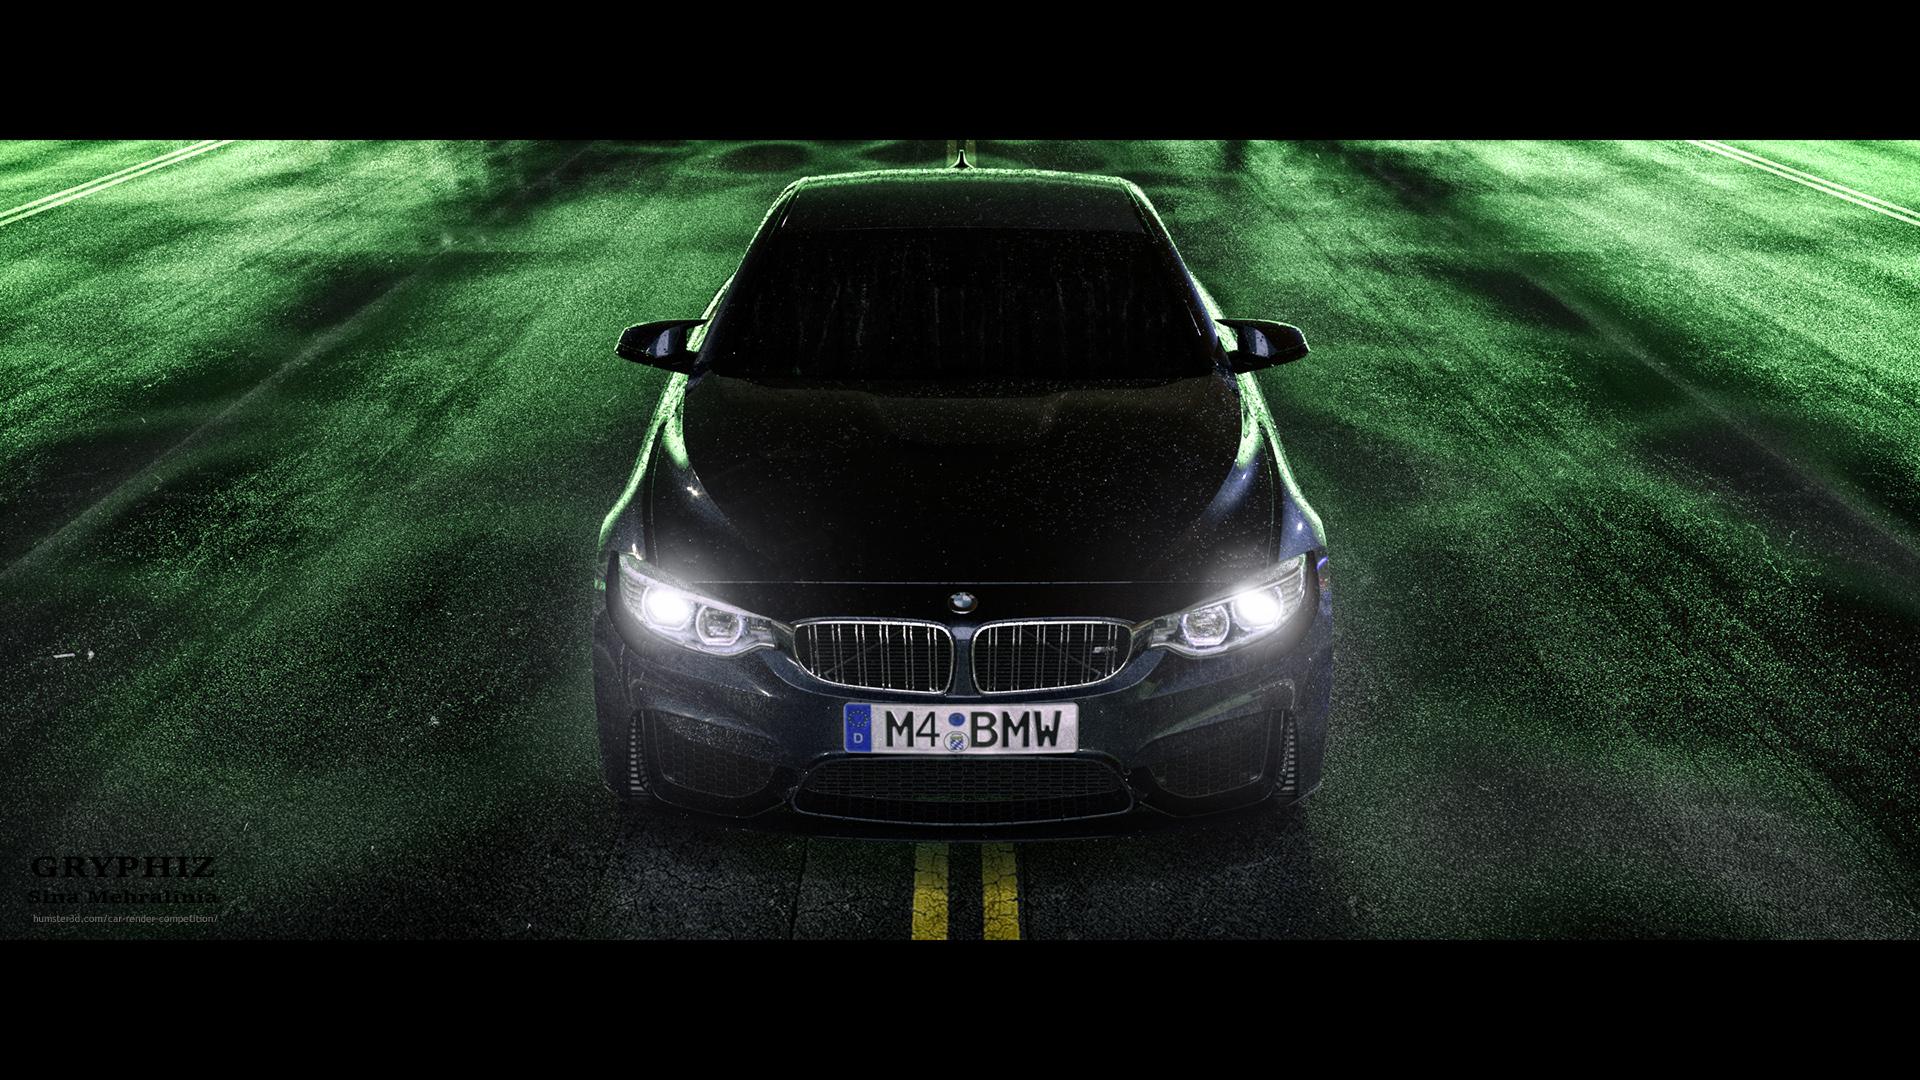 BMW M4 3d art